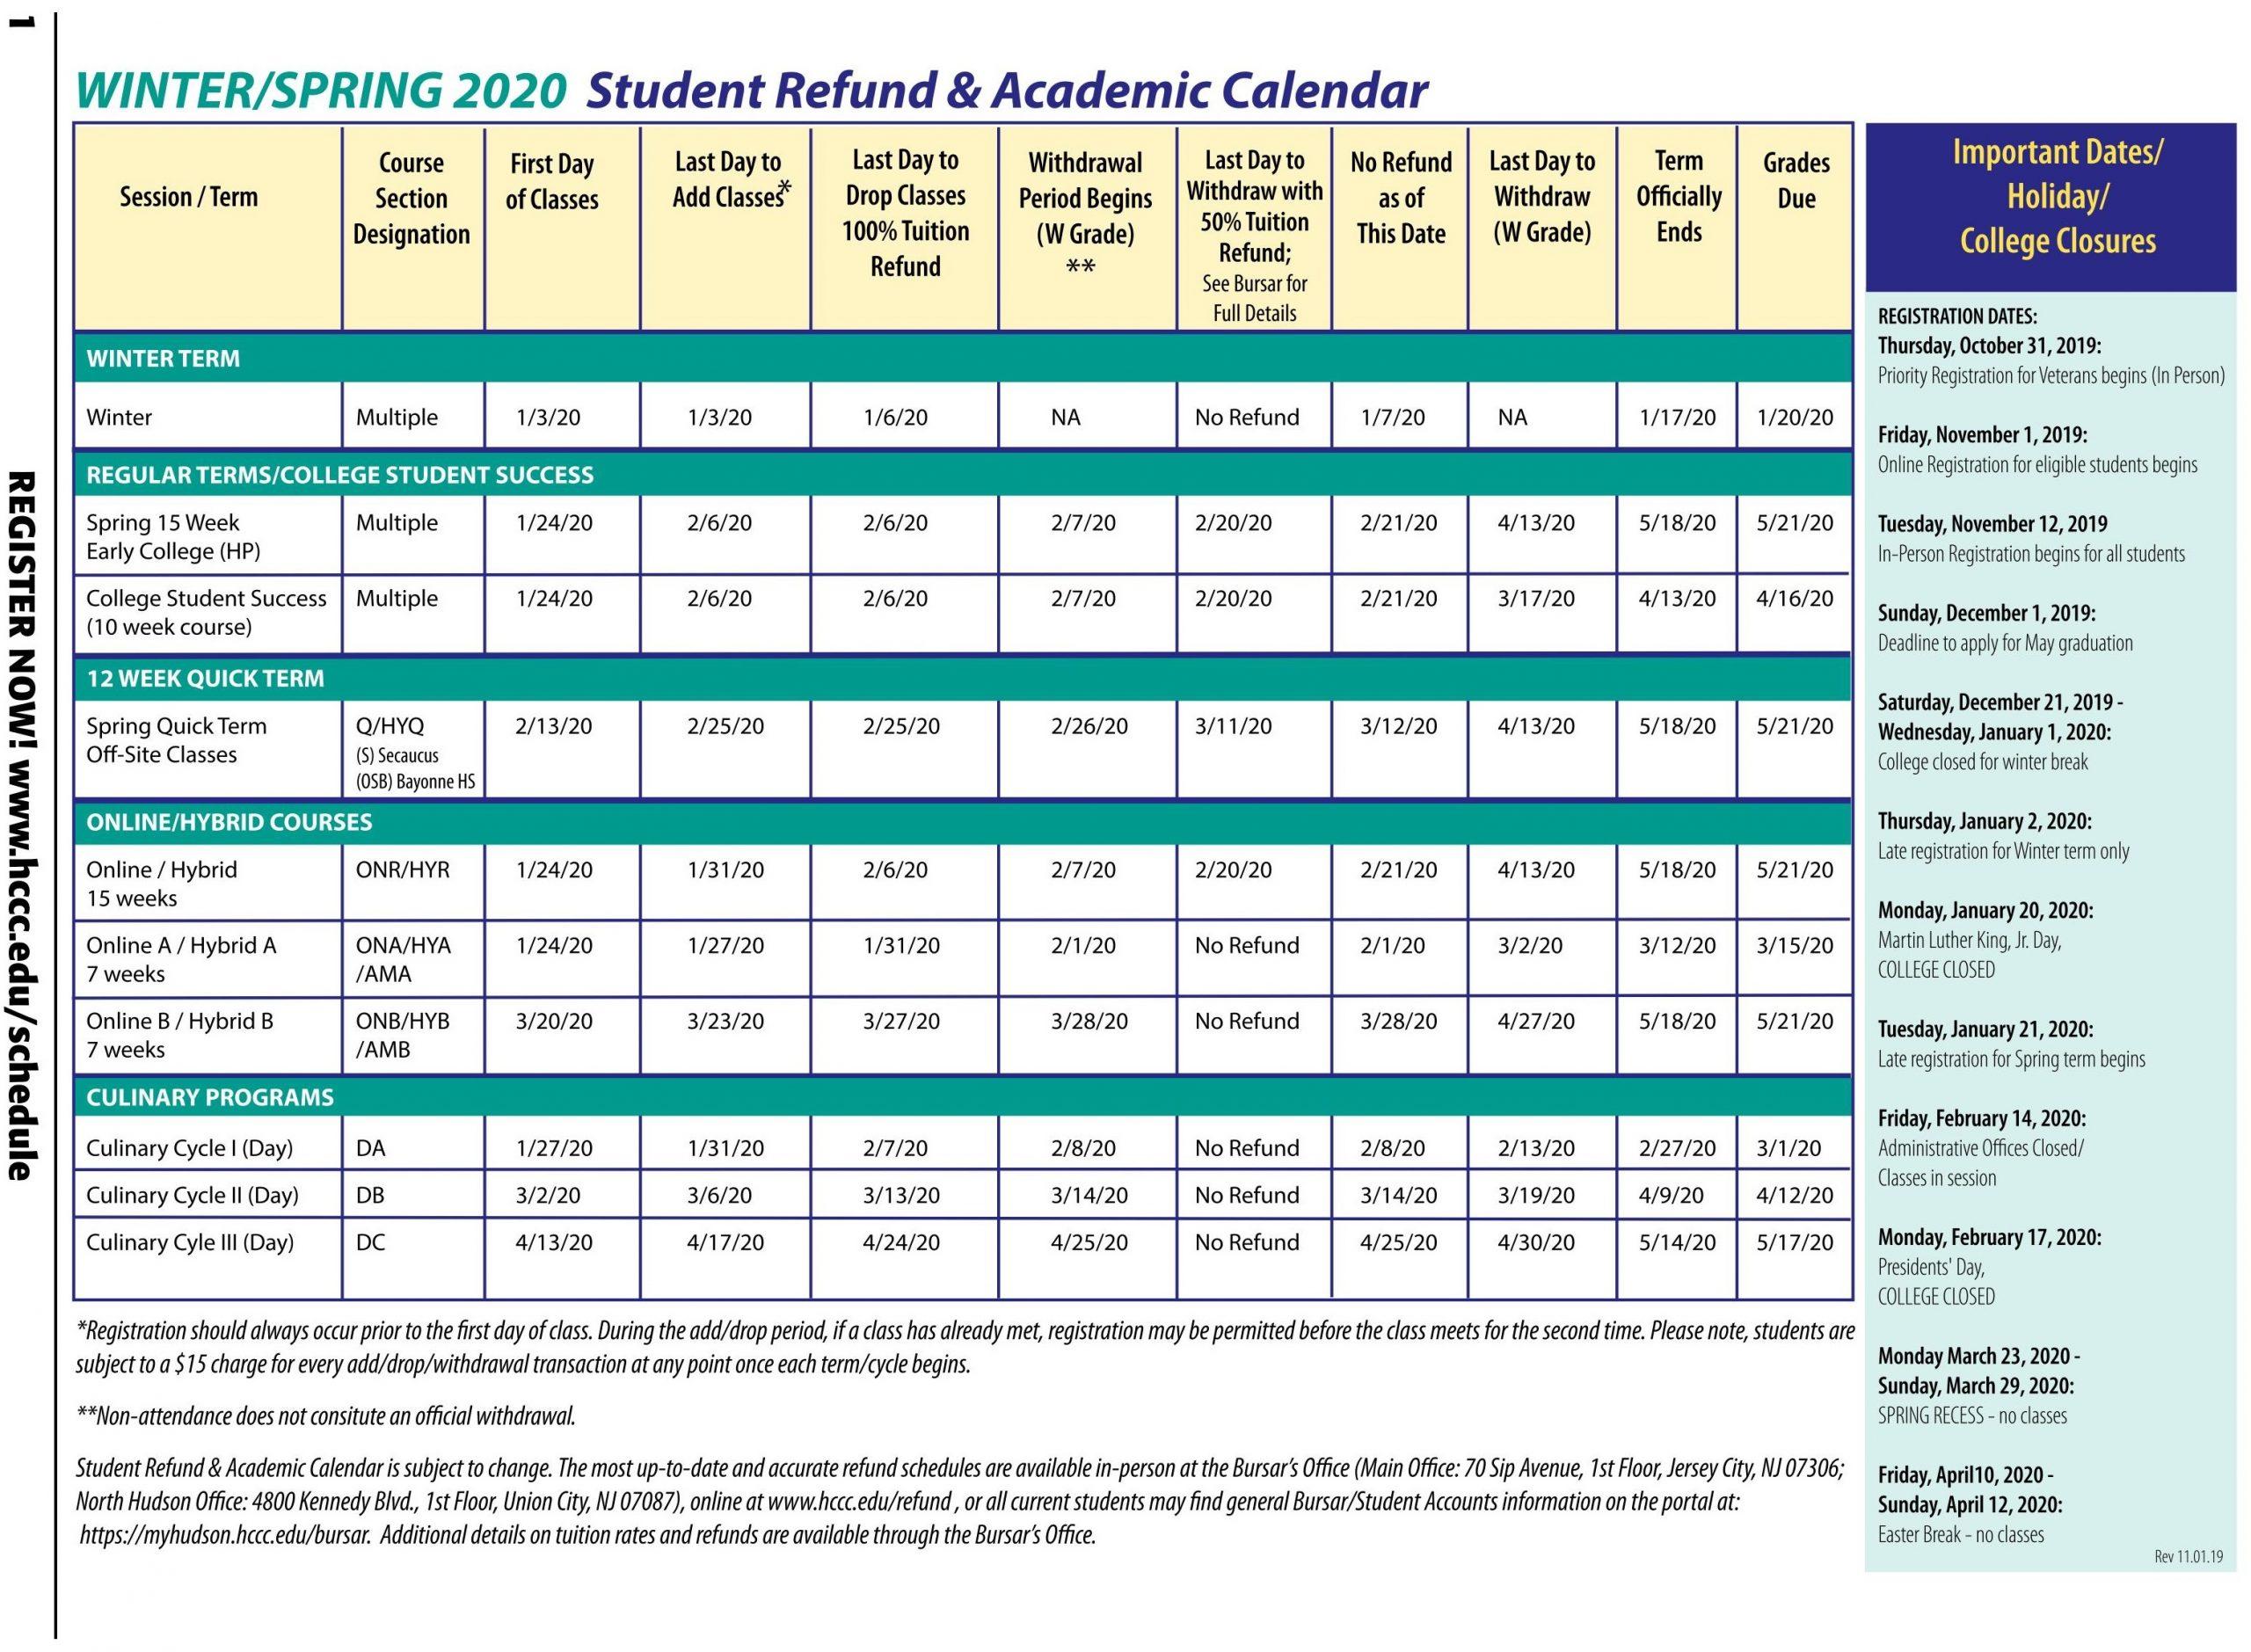 Delaware University Academic Calendar | Printable Calendar Intended For American River College Academic Calendar 2021